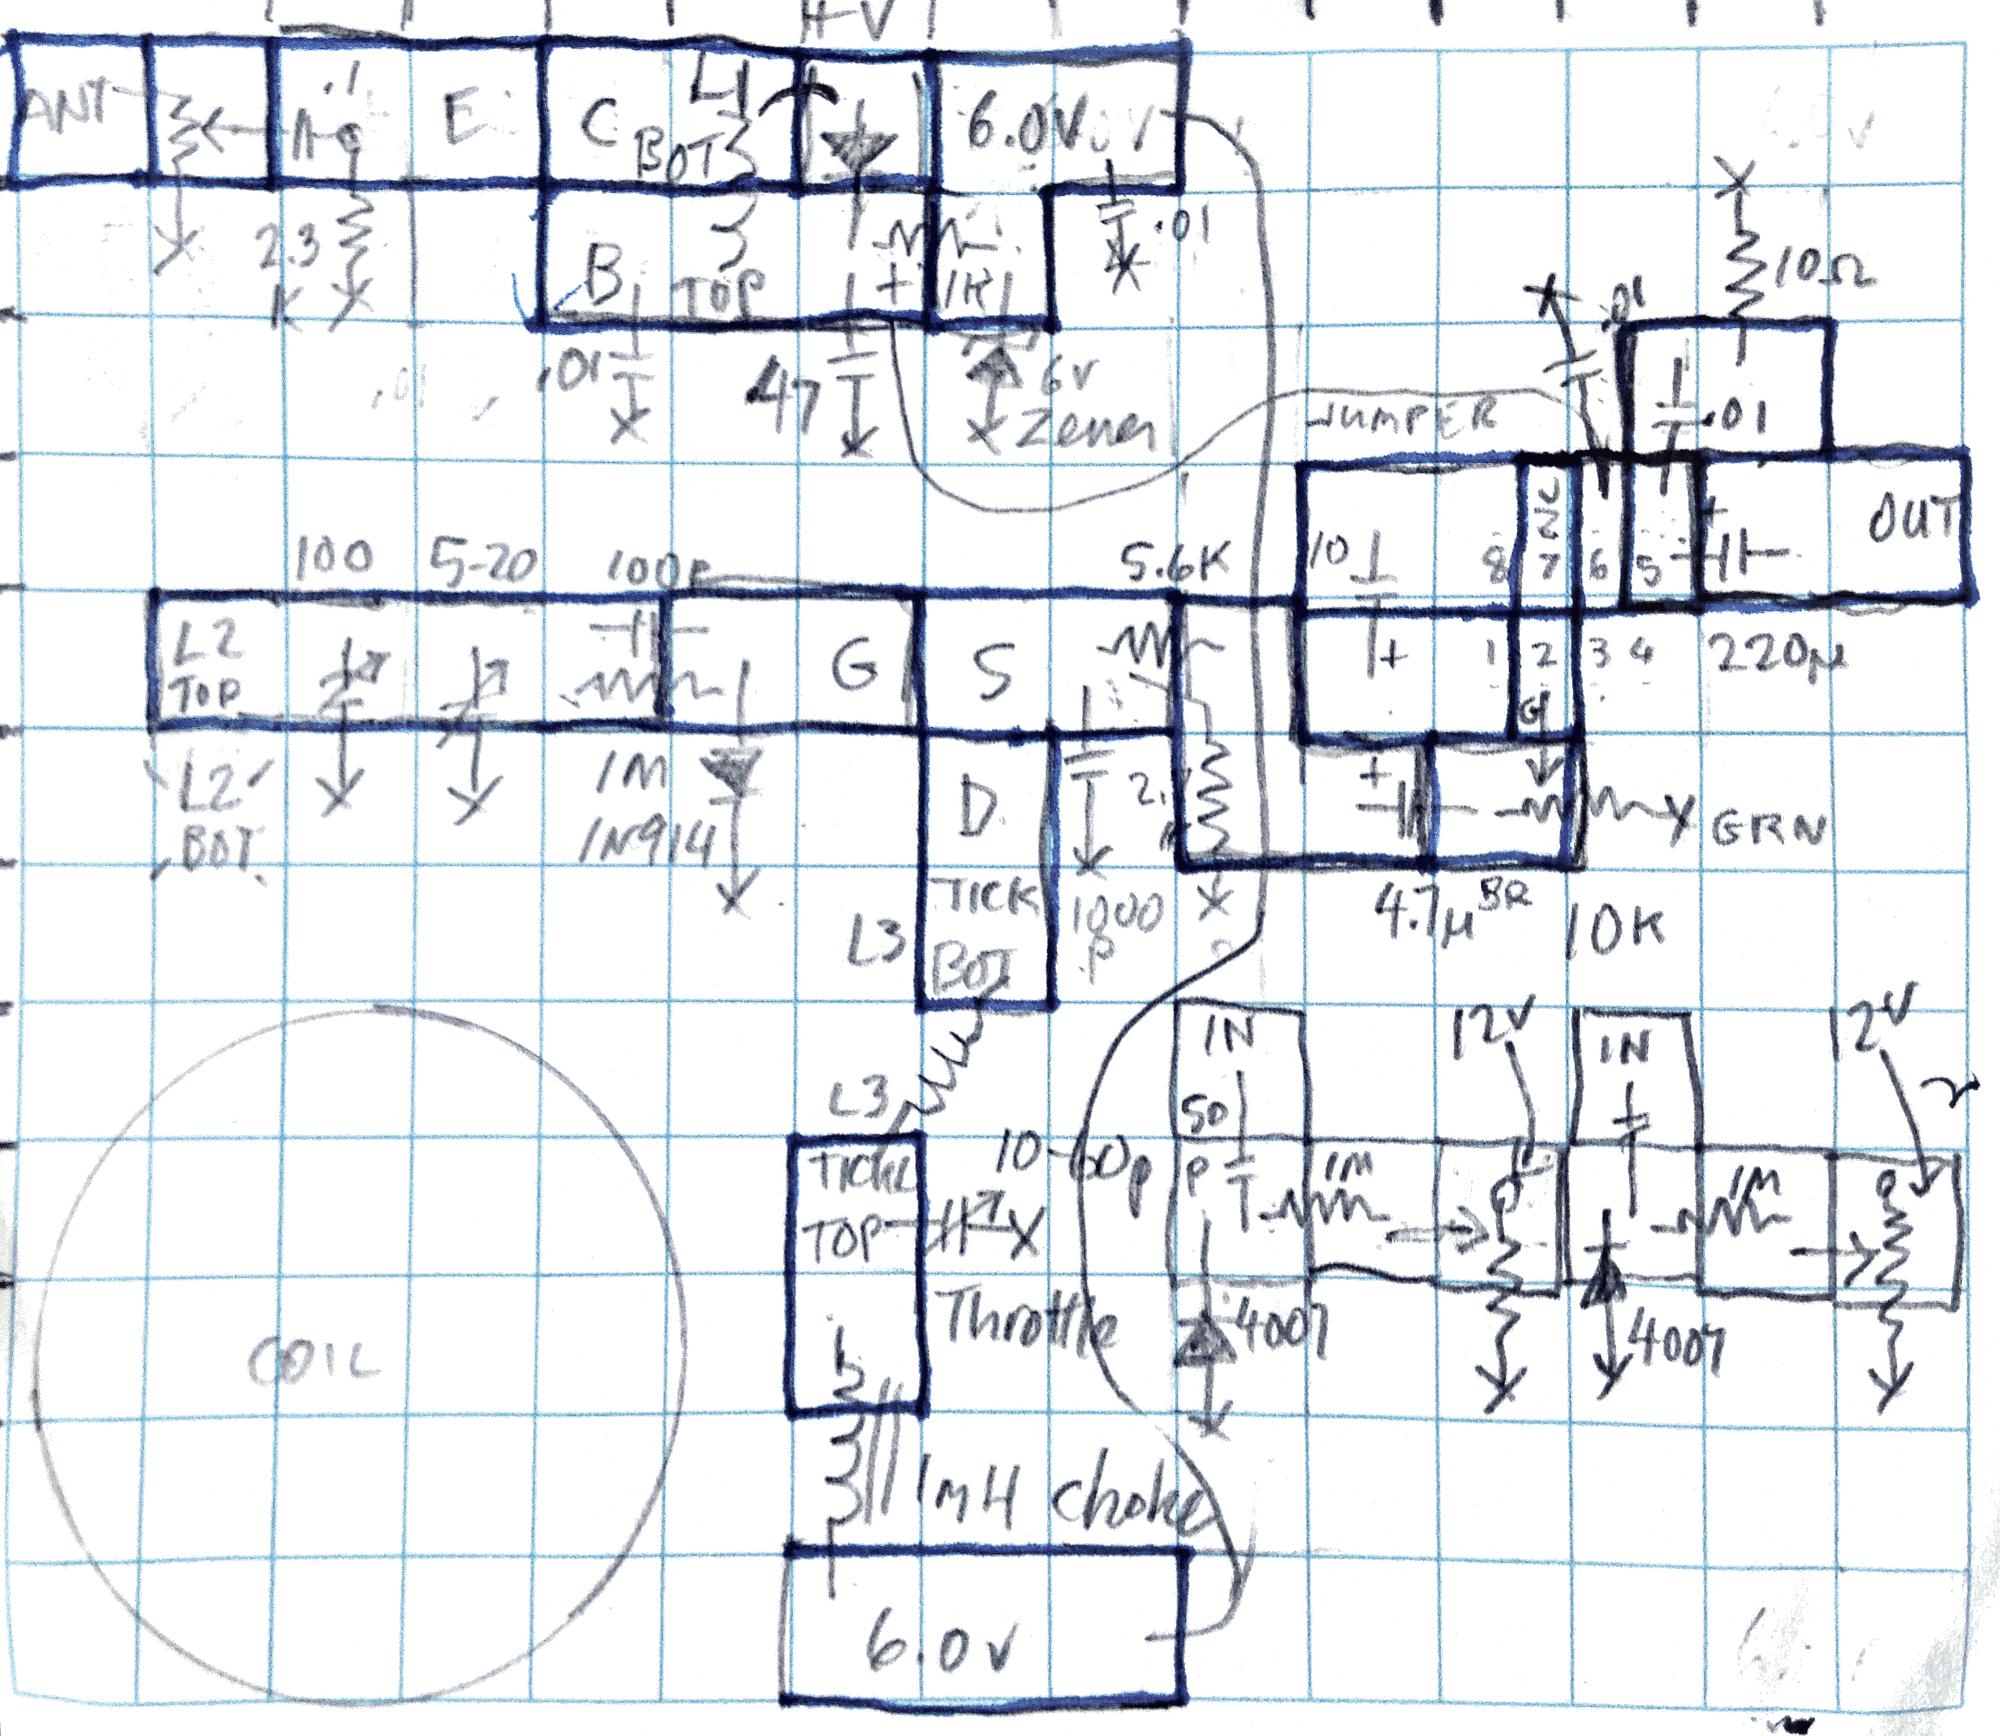 Circuit board cutout plan